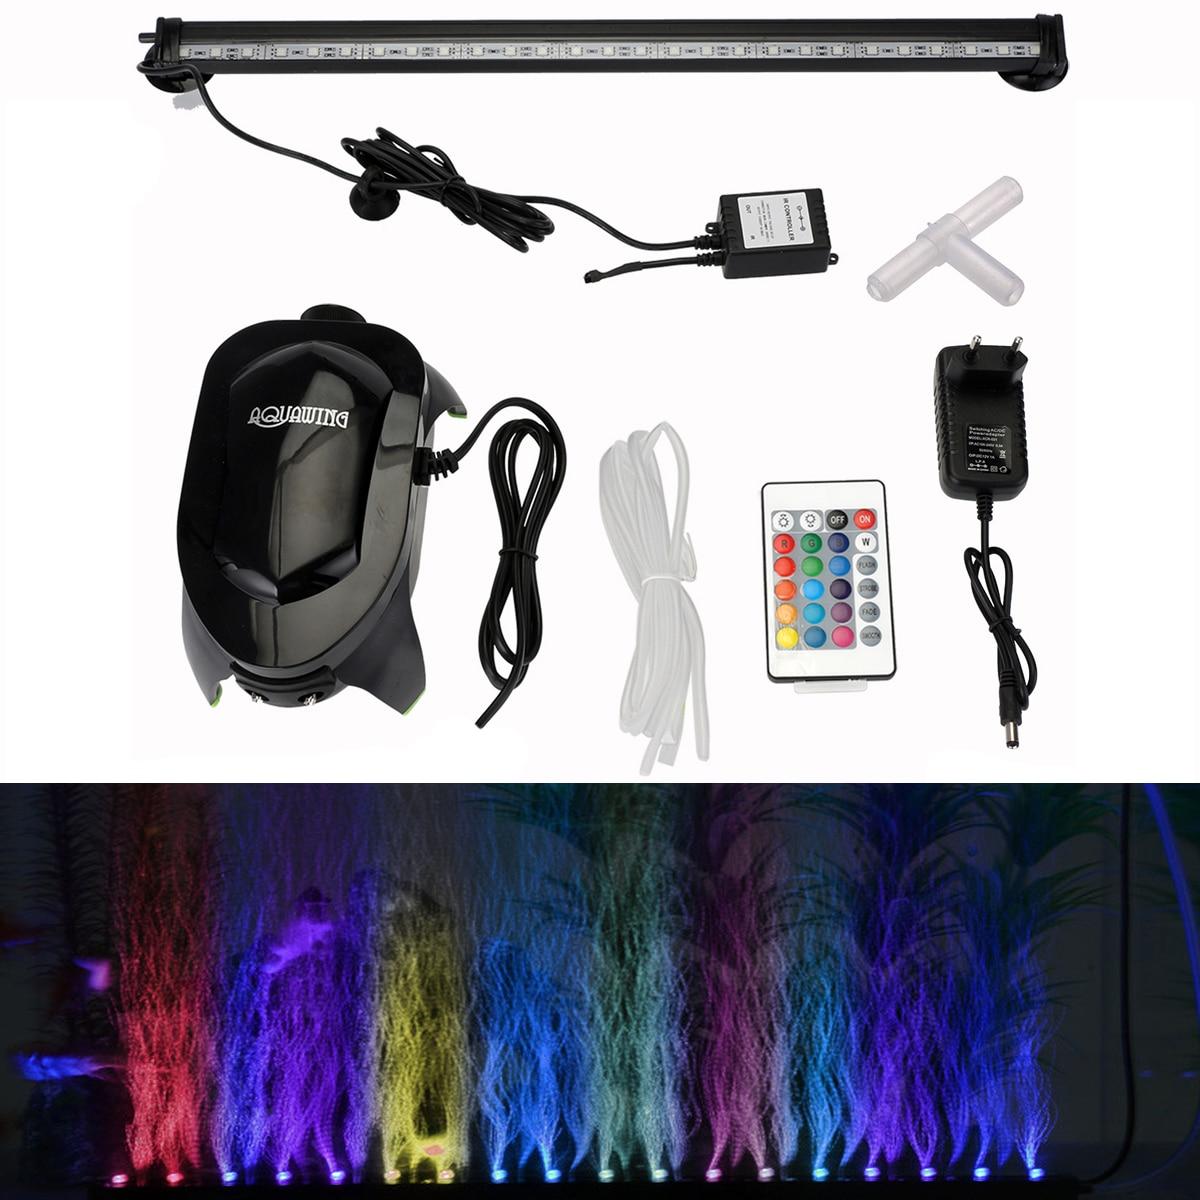 EU Plug Underwater Aquarium Fish Tank Air Bubble <font><b>Light</b></font> 5050 RGB <font><b>LED</b></font> Submersible Lamp + Increase Oxygen Air Pump + IR Remote